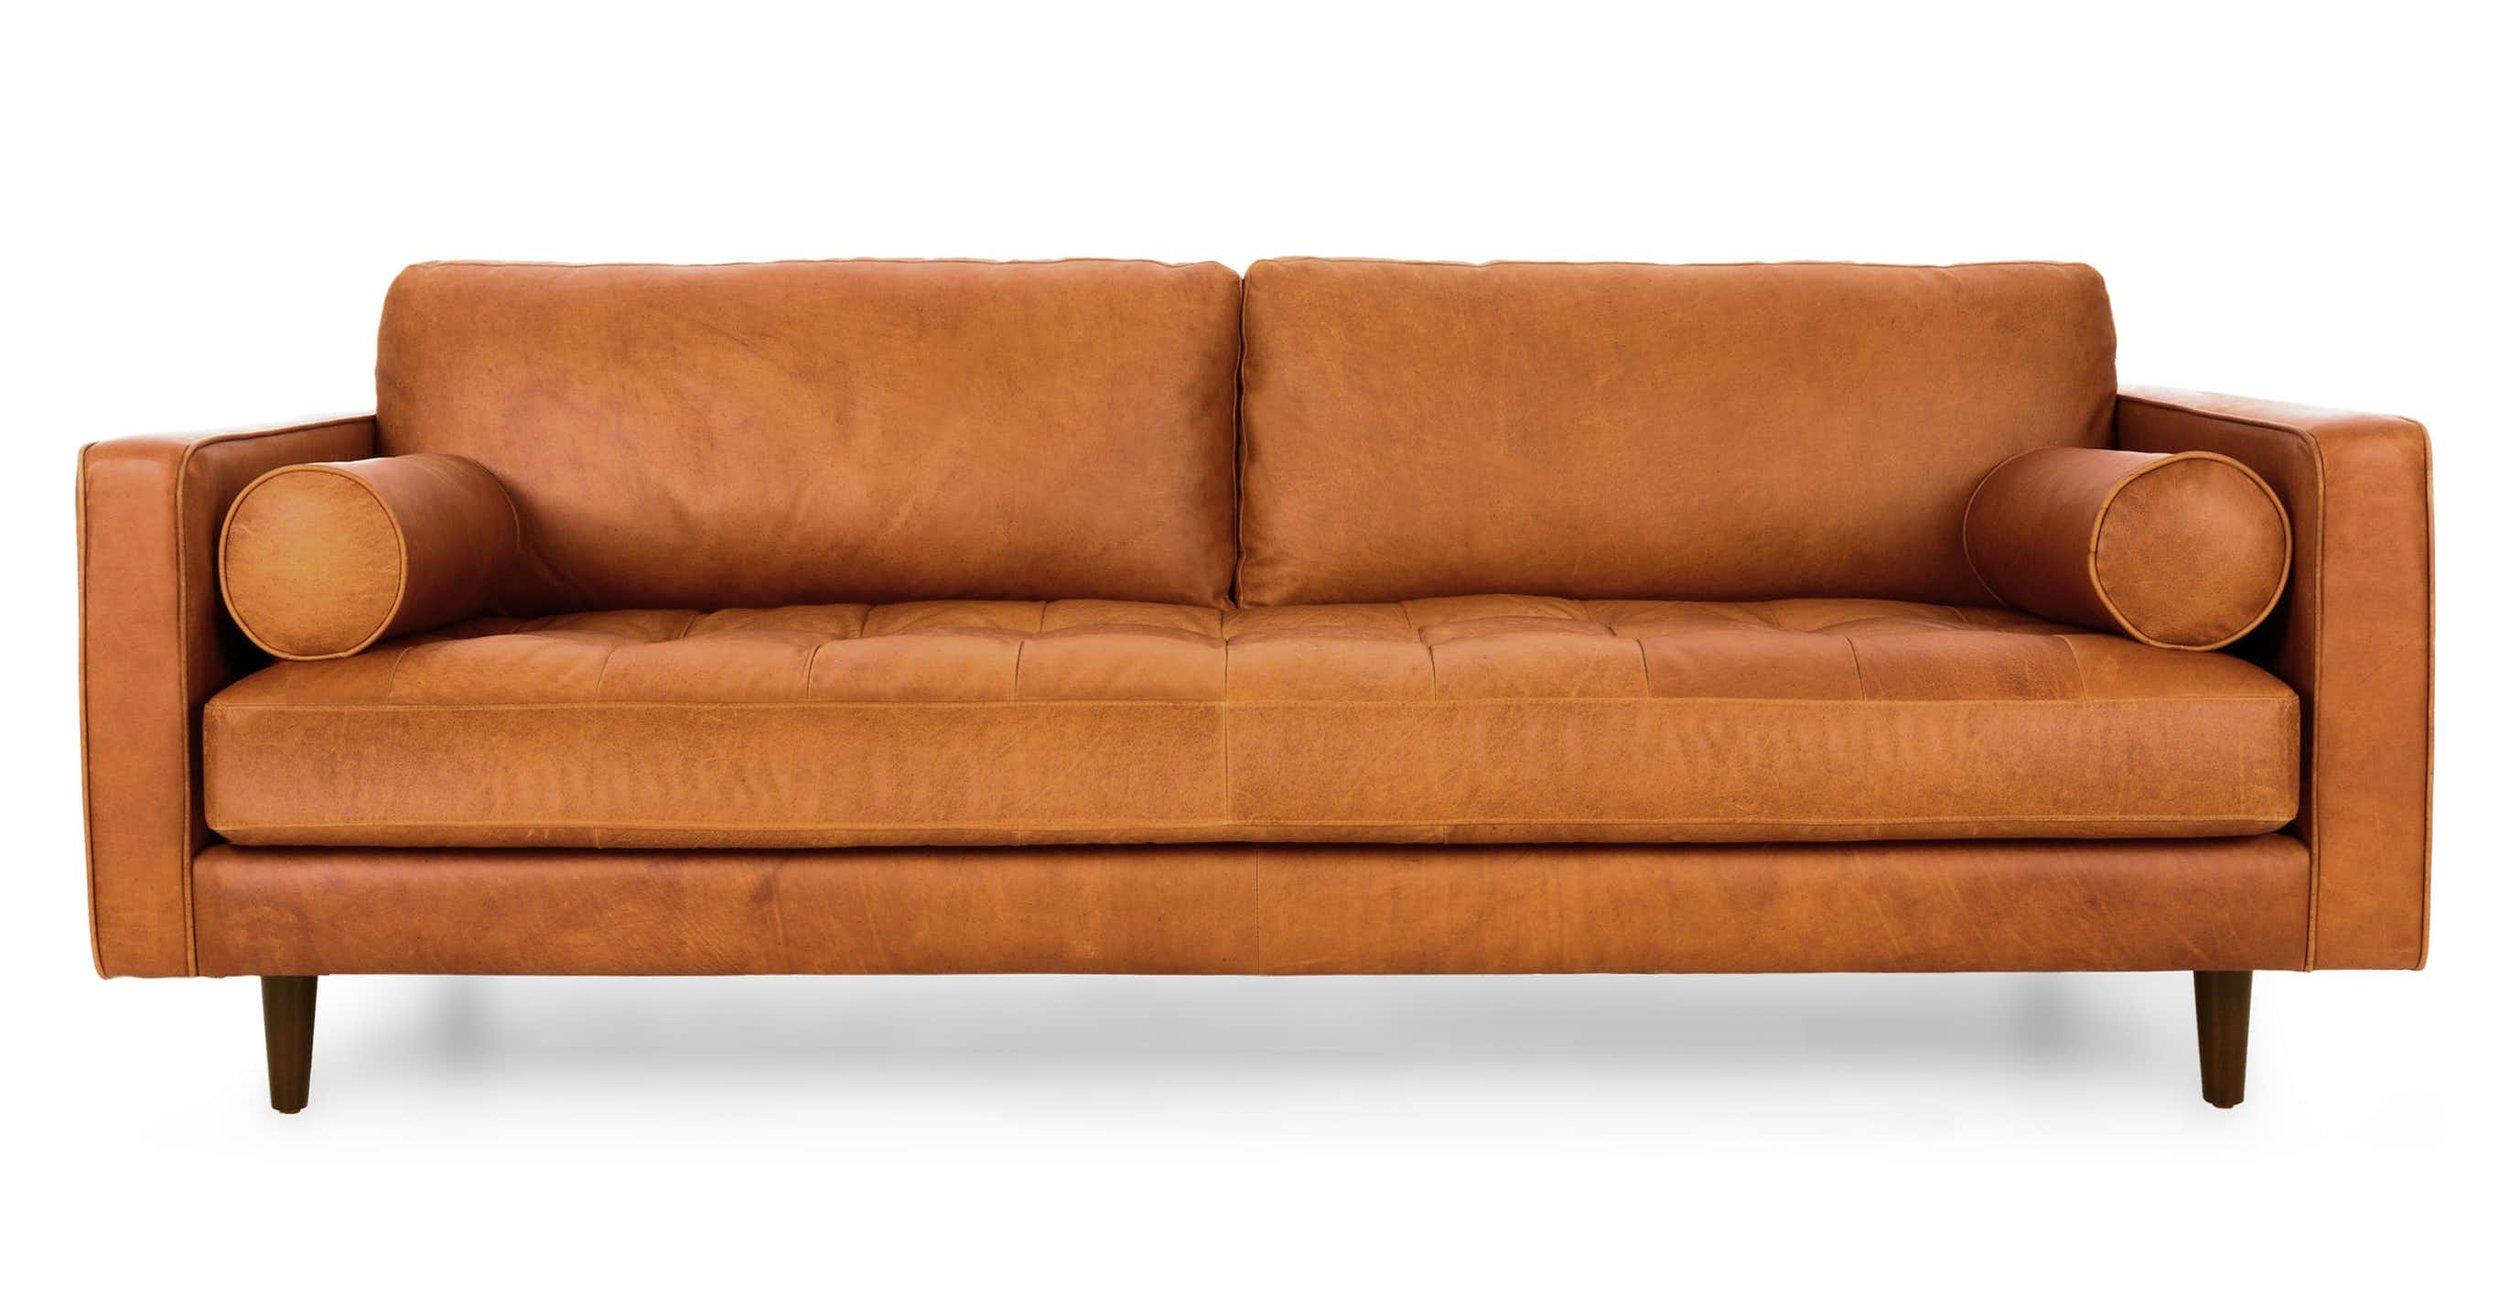 Sven sofa.jpg